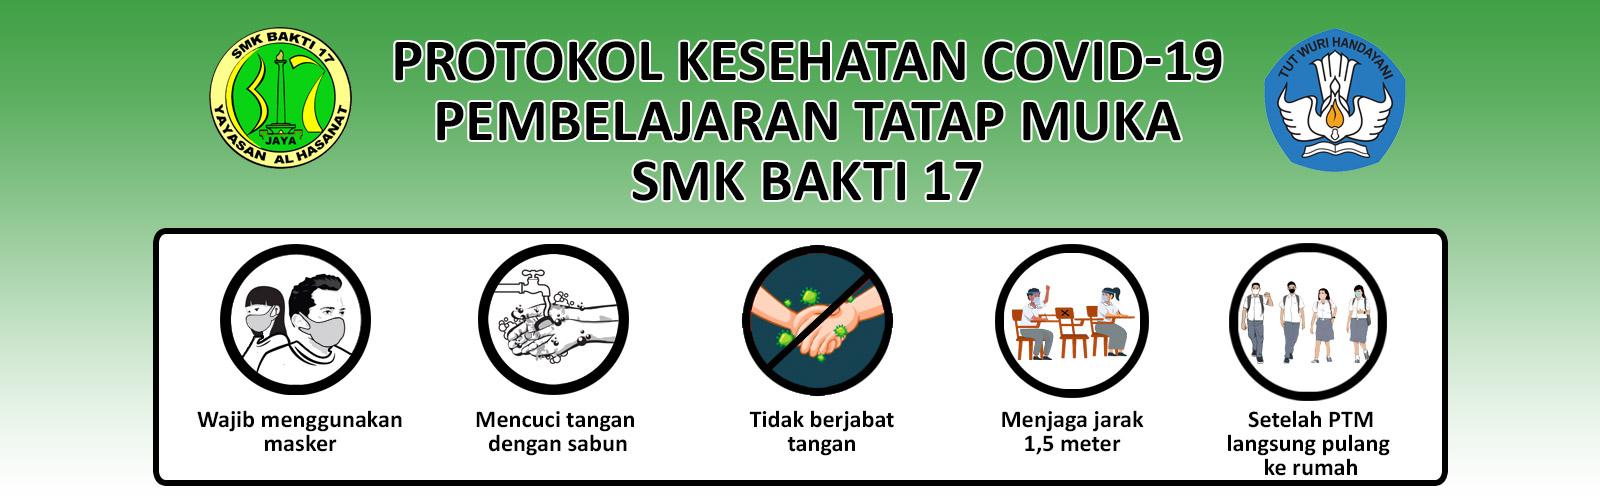 Pembelajaran tatap muka SMK Bakti 17